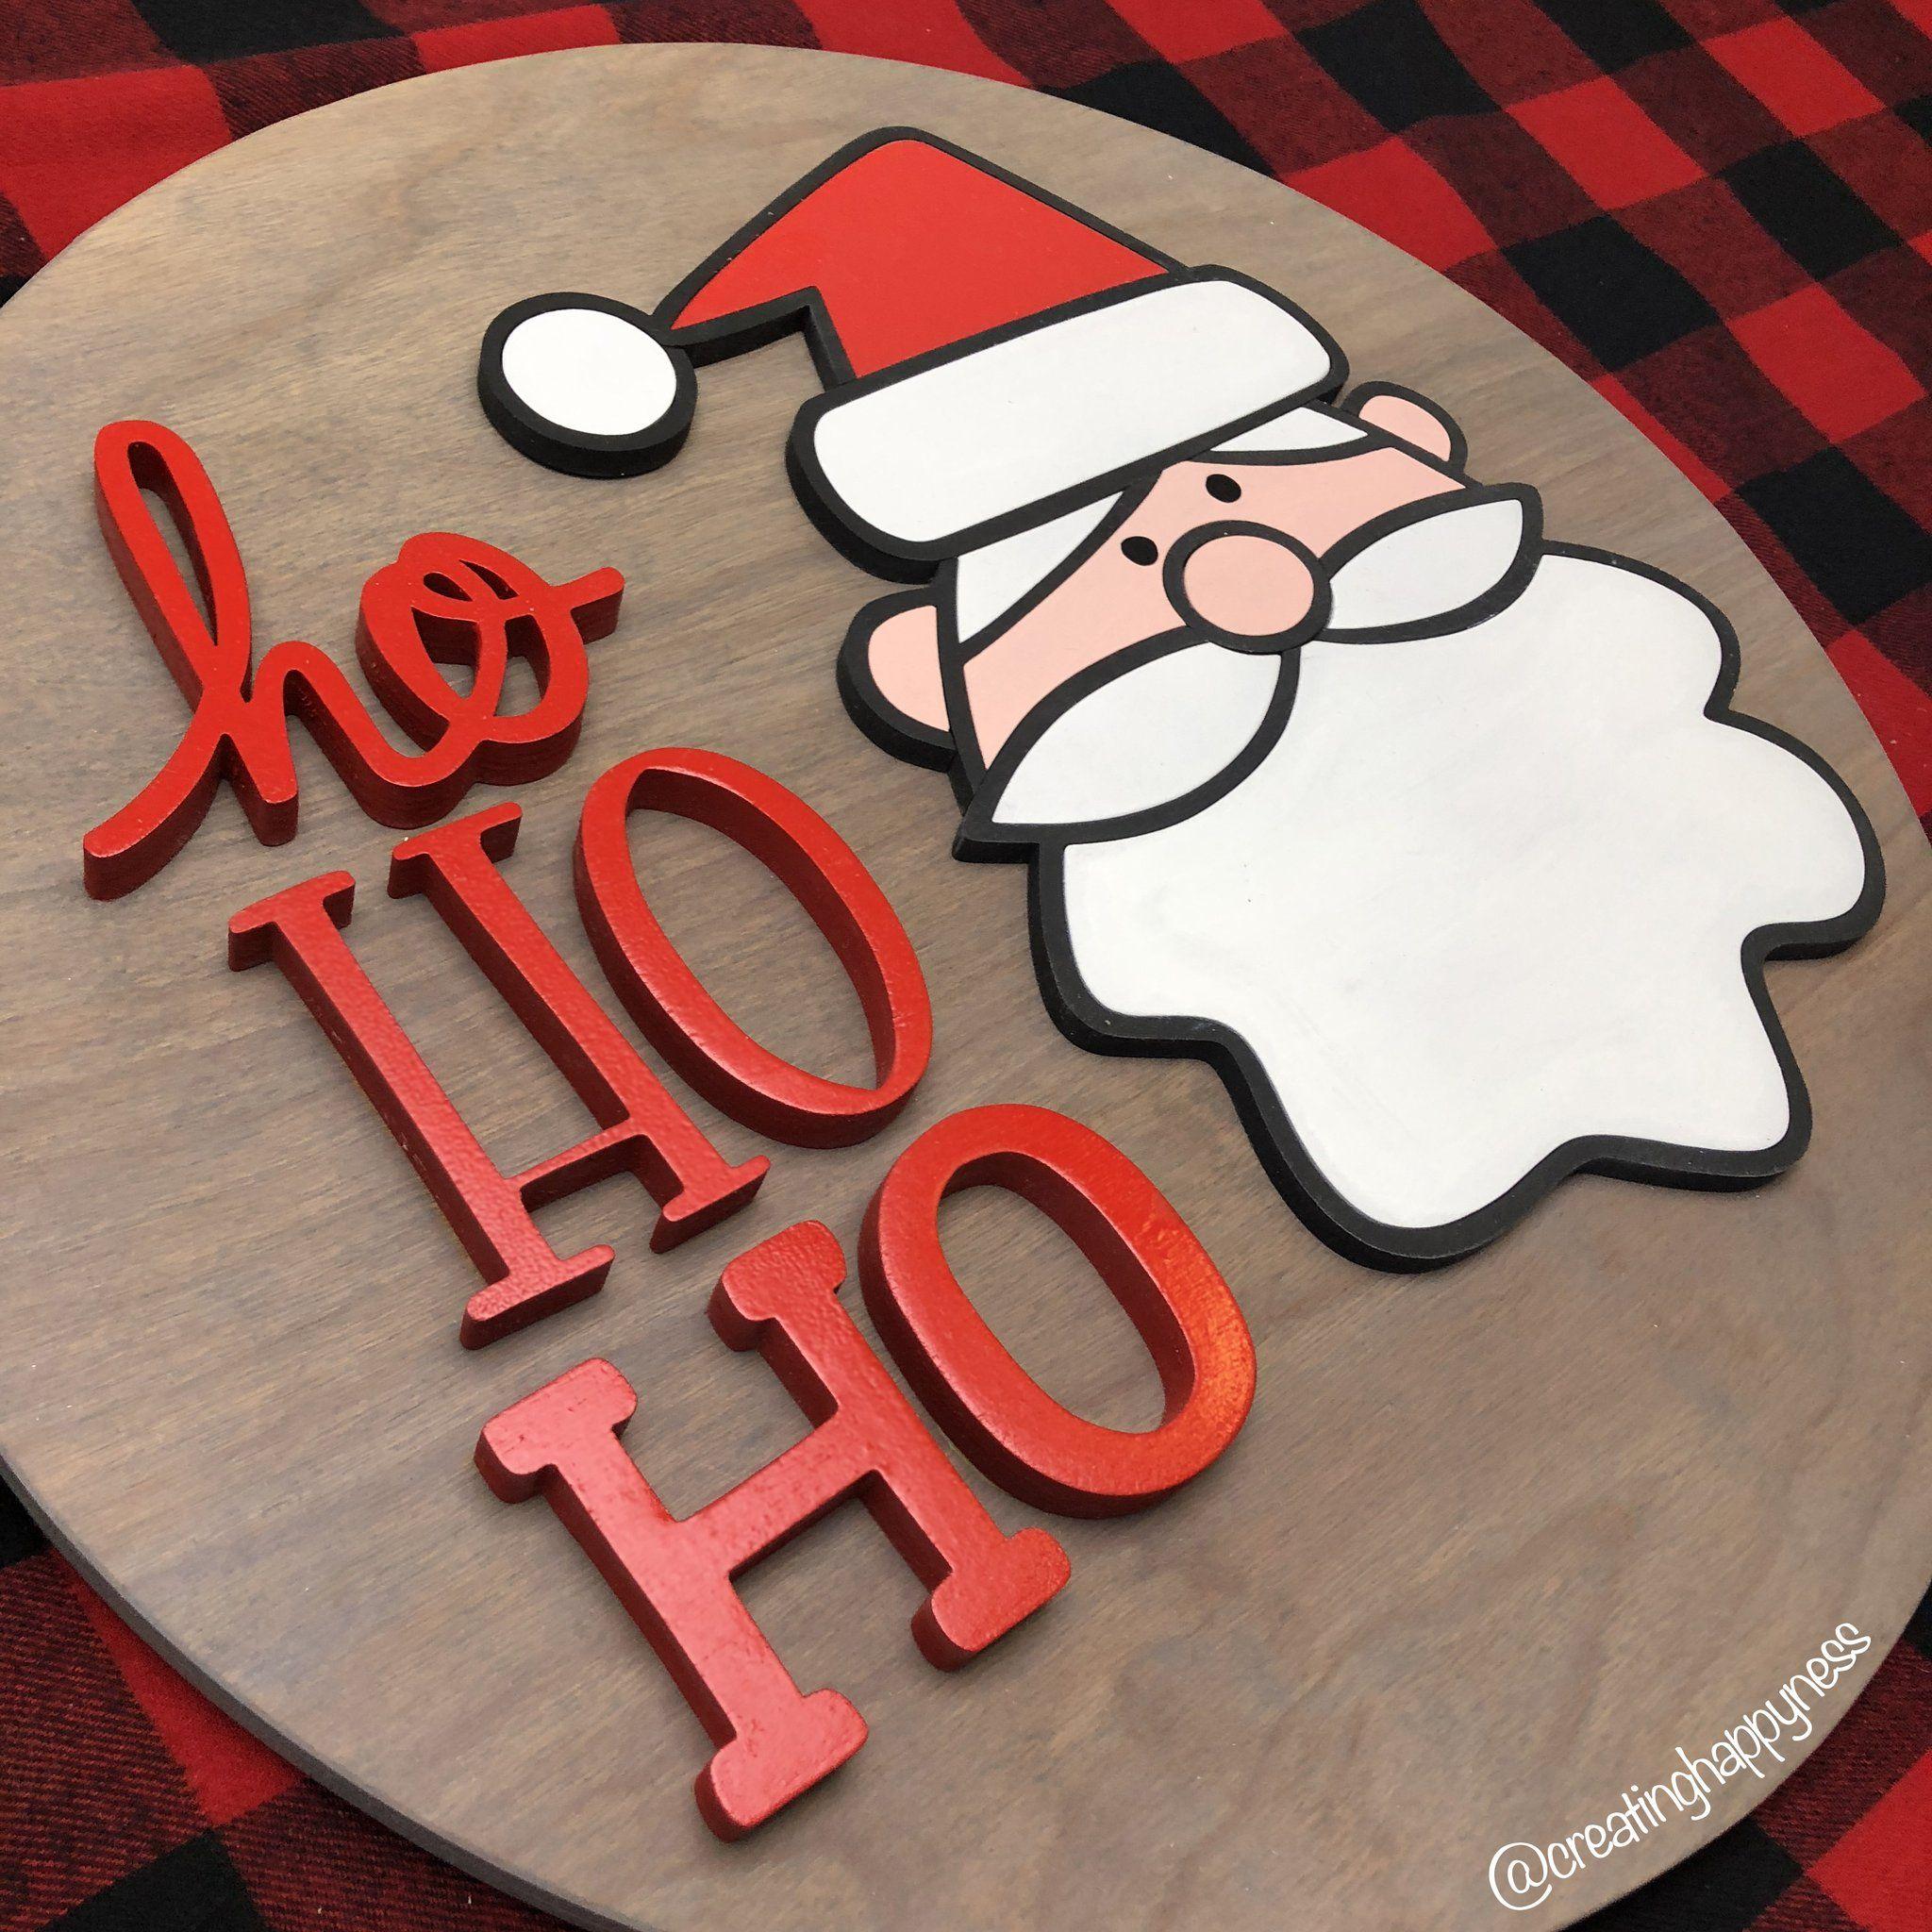 "/""Ho Ho Ho/"" Christmas decoration freestanding wooden letters sign"